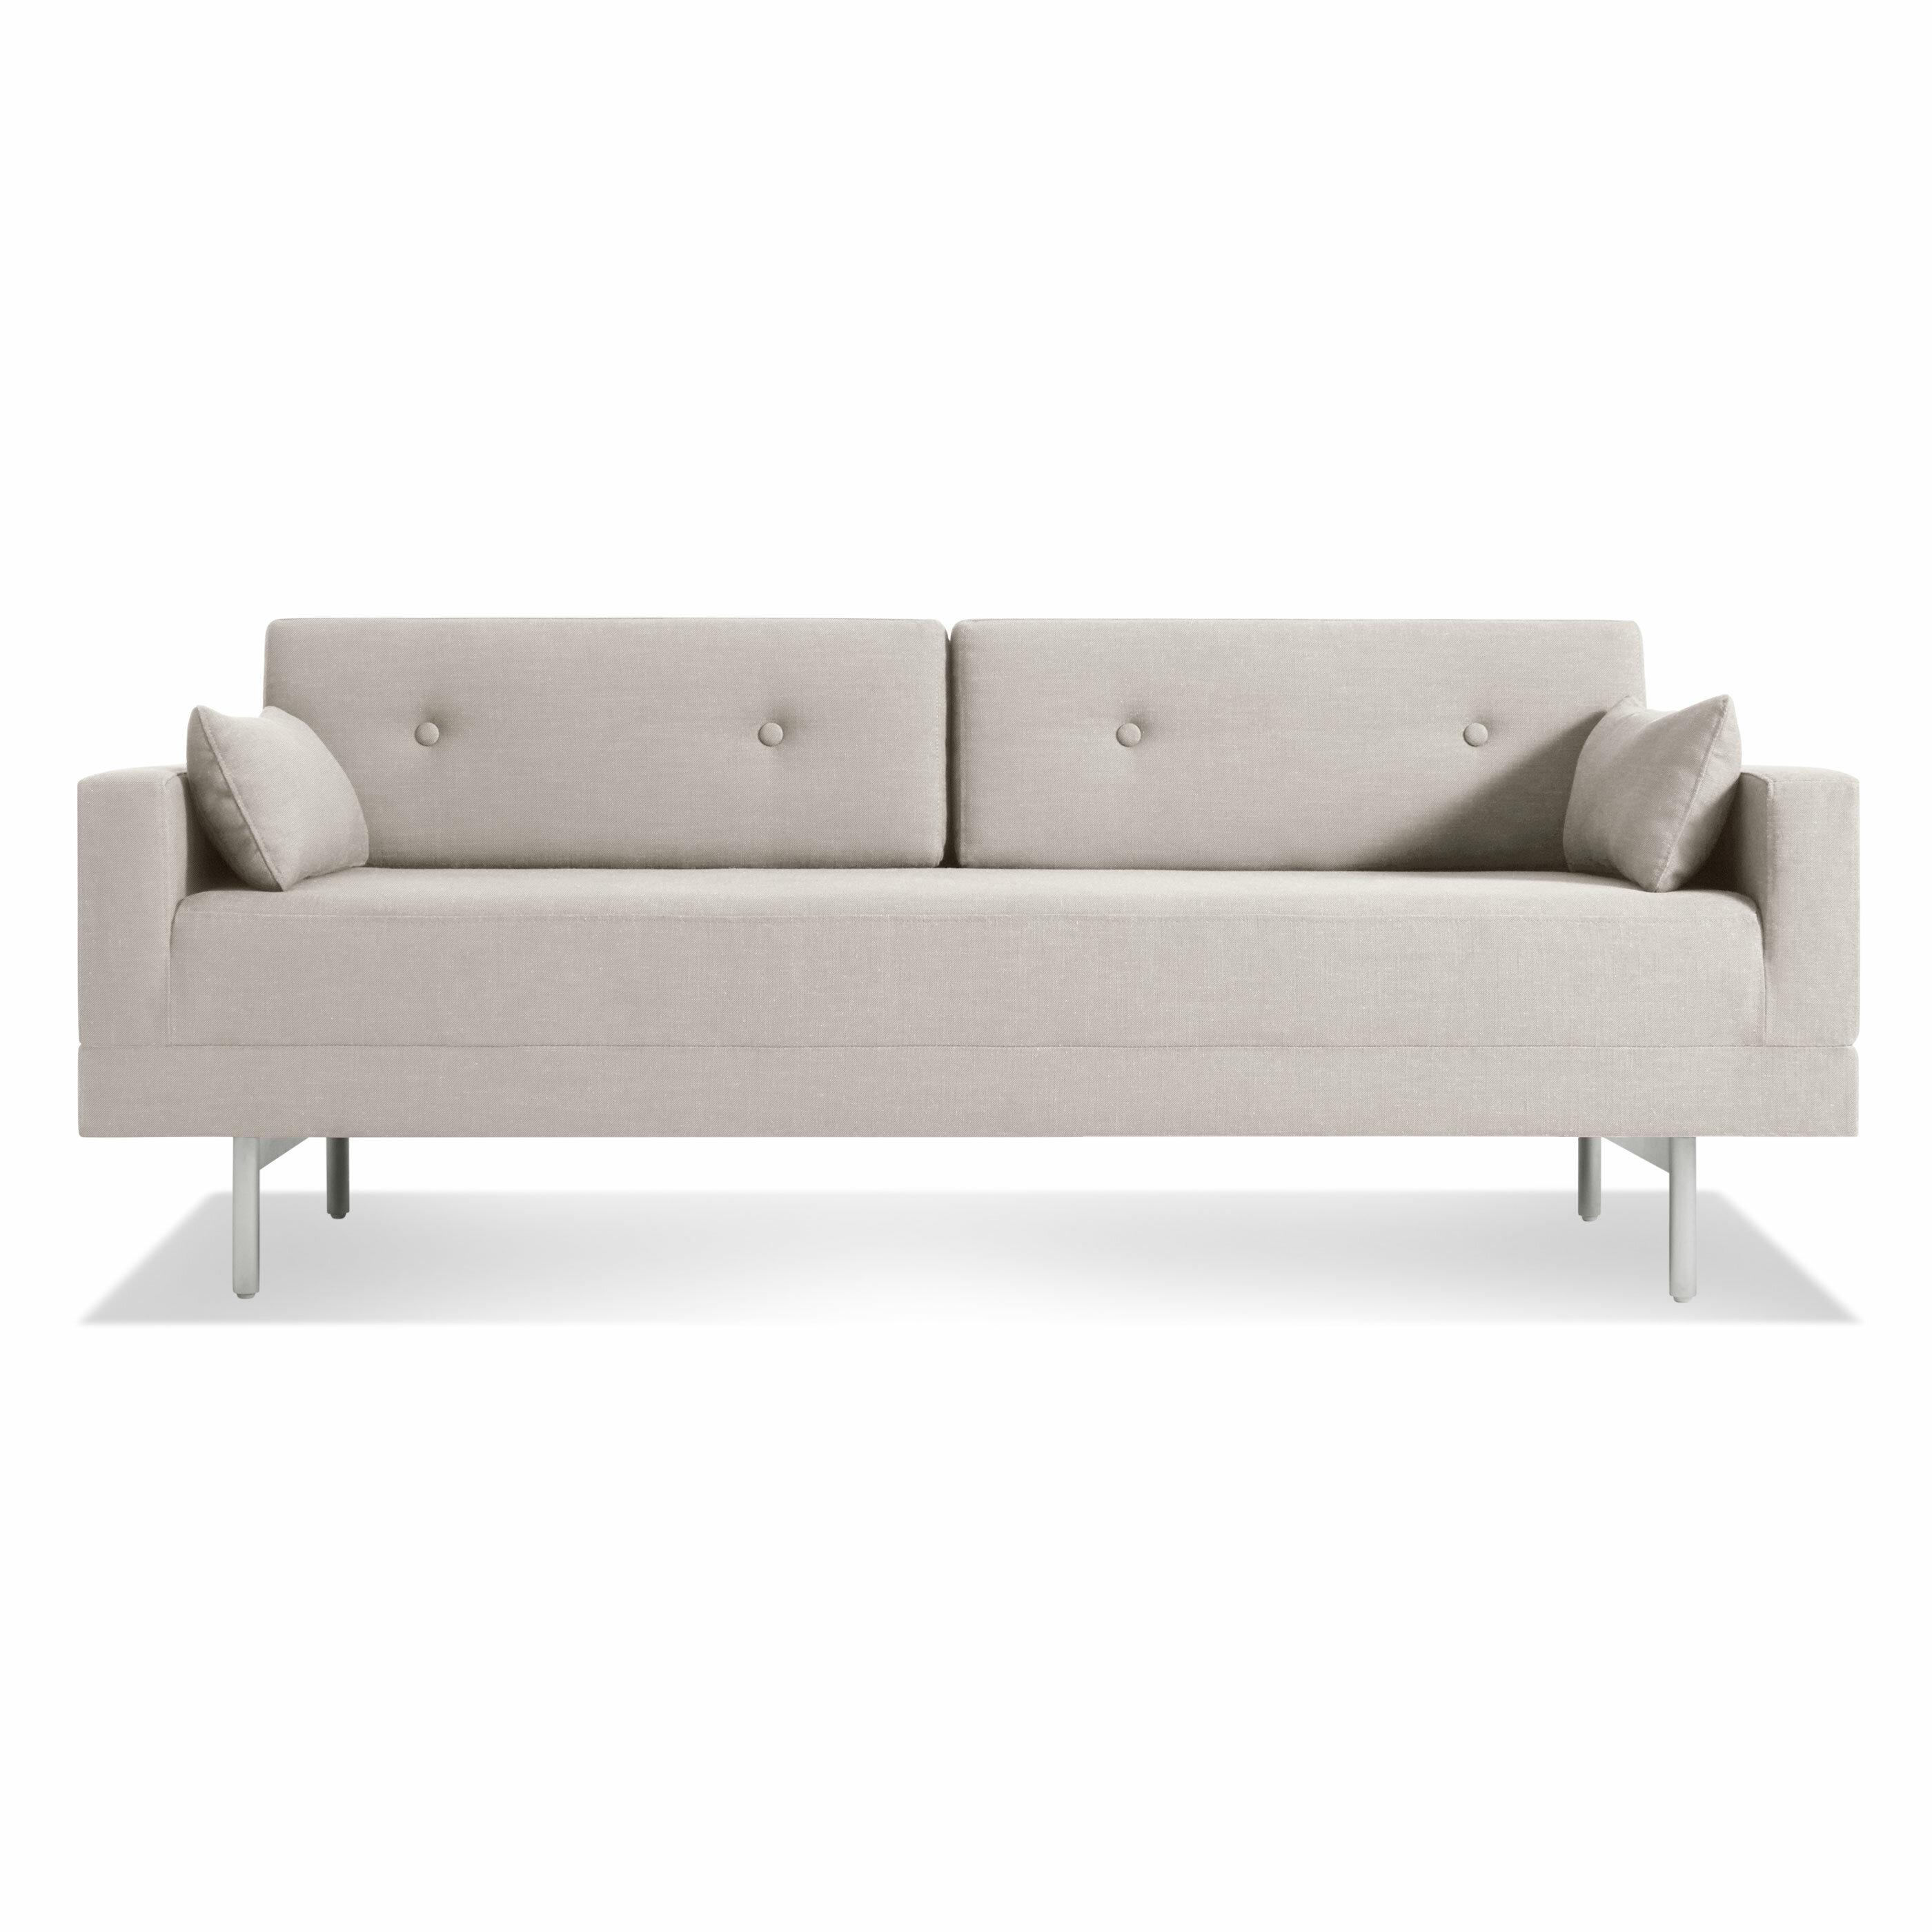 One Night Stand Sleeper Sofa & Reviews   AllModern